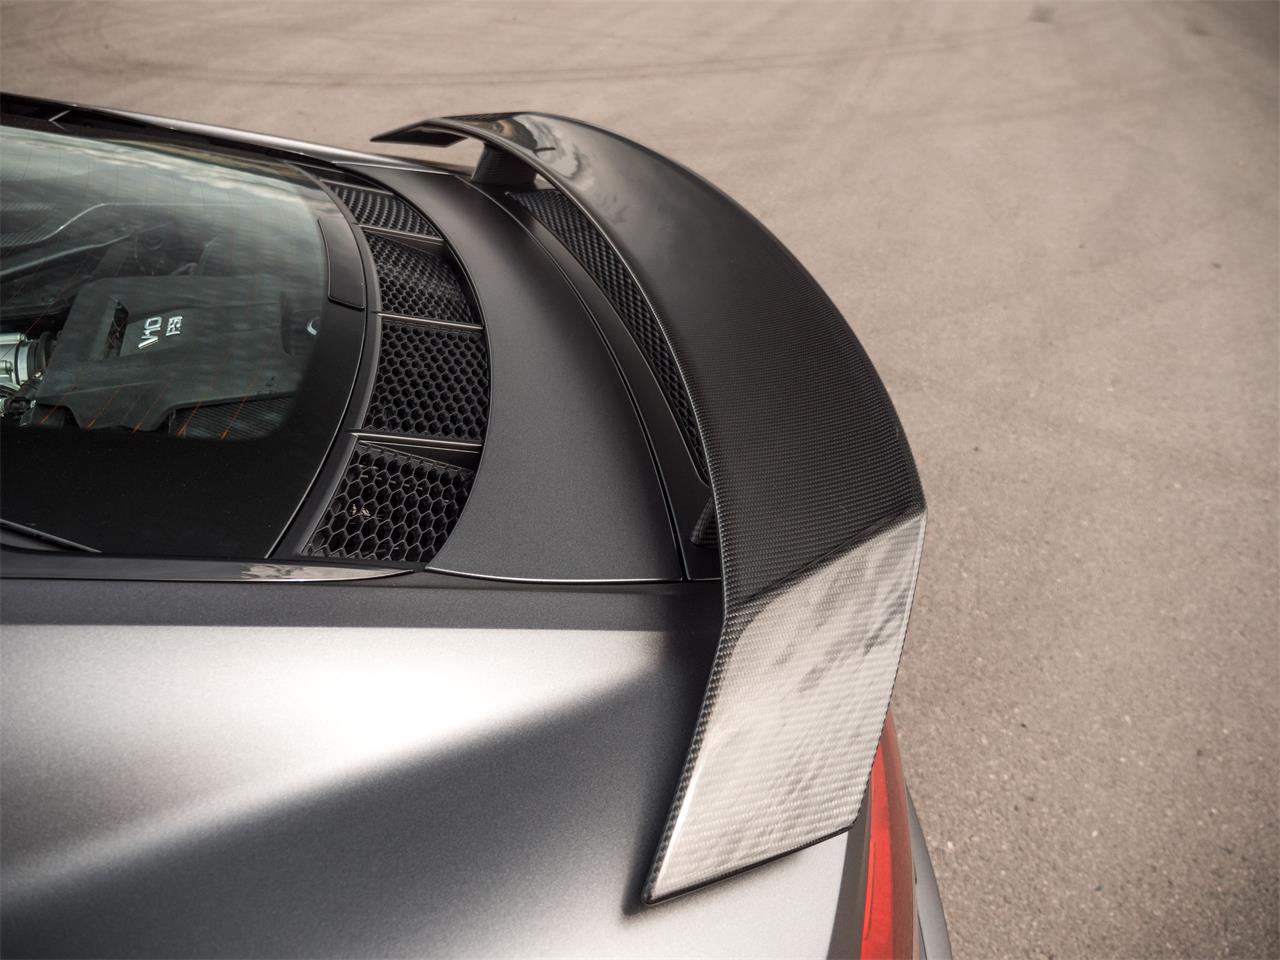 2017 Audi R8 (CC-1250113) for sale in Kelowna, British Columbia